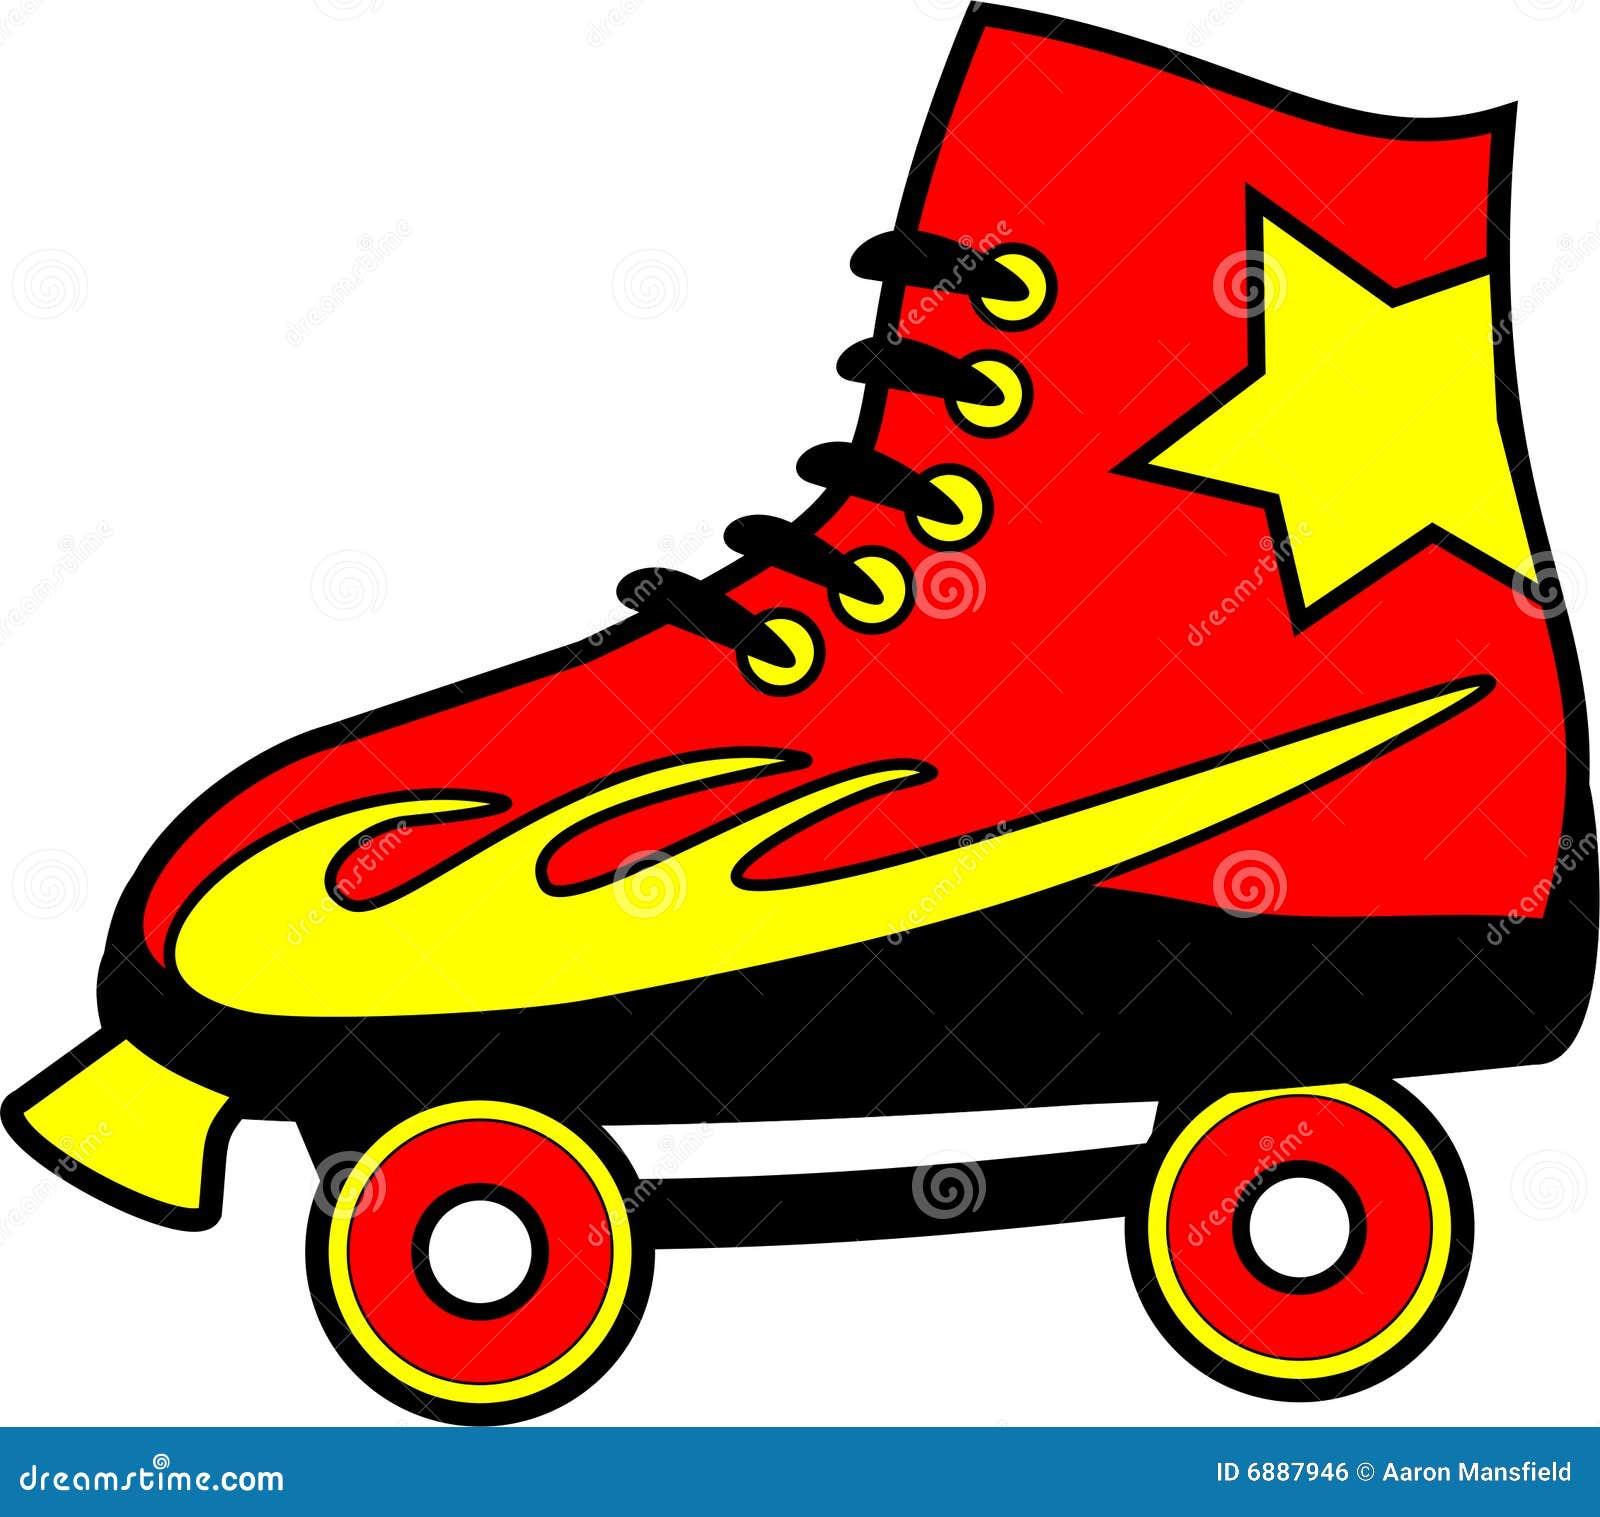 Roller Skate Royalty Free Stock Image - Image: 6887946